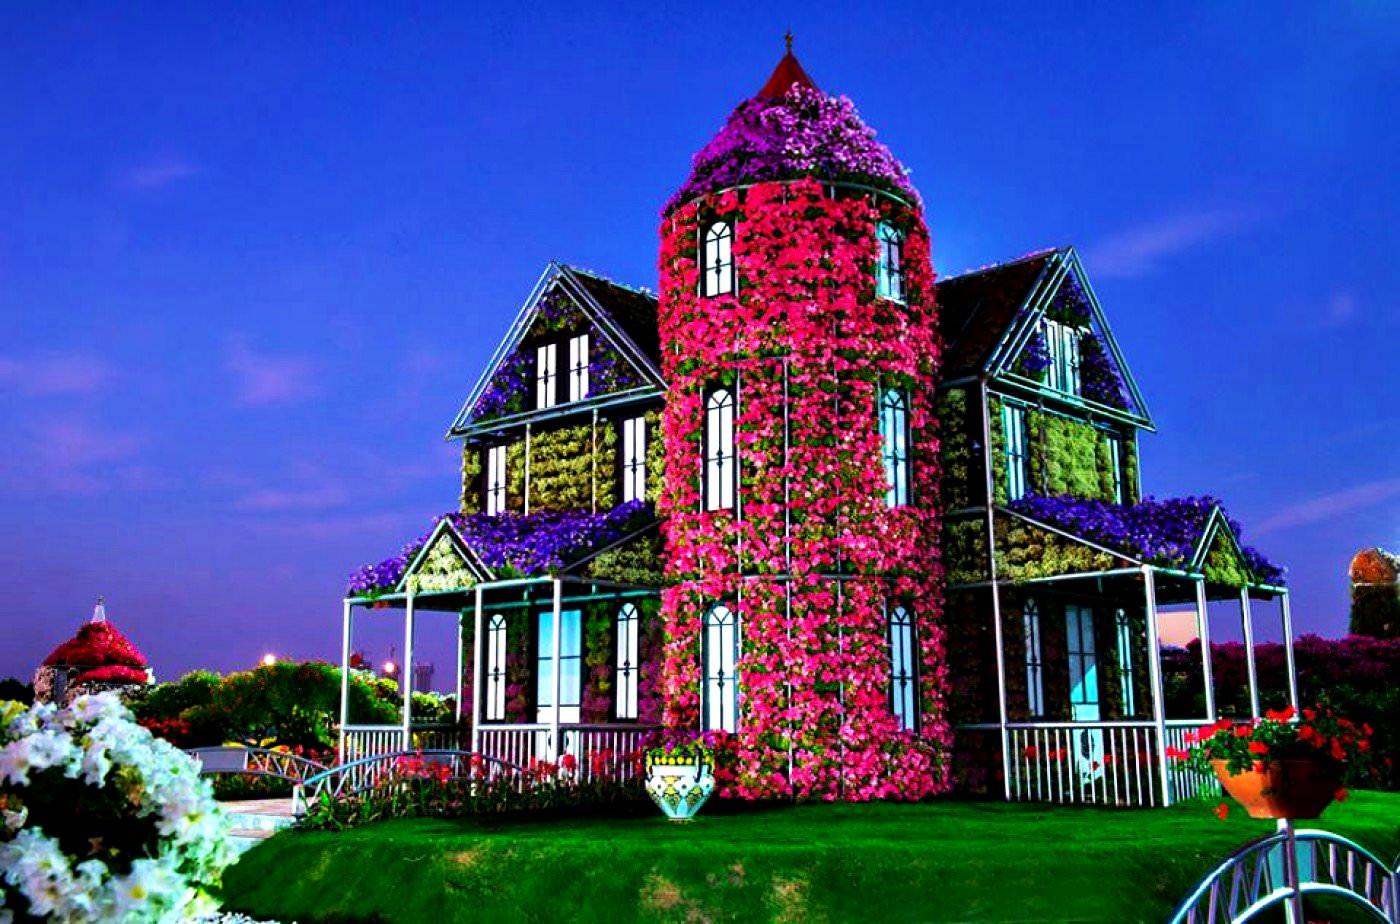 flower house in dubai miracle garden park united arab emirates - Miracle Garden Dubai